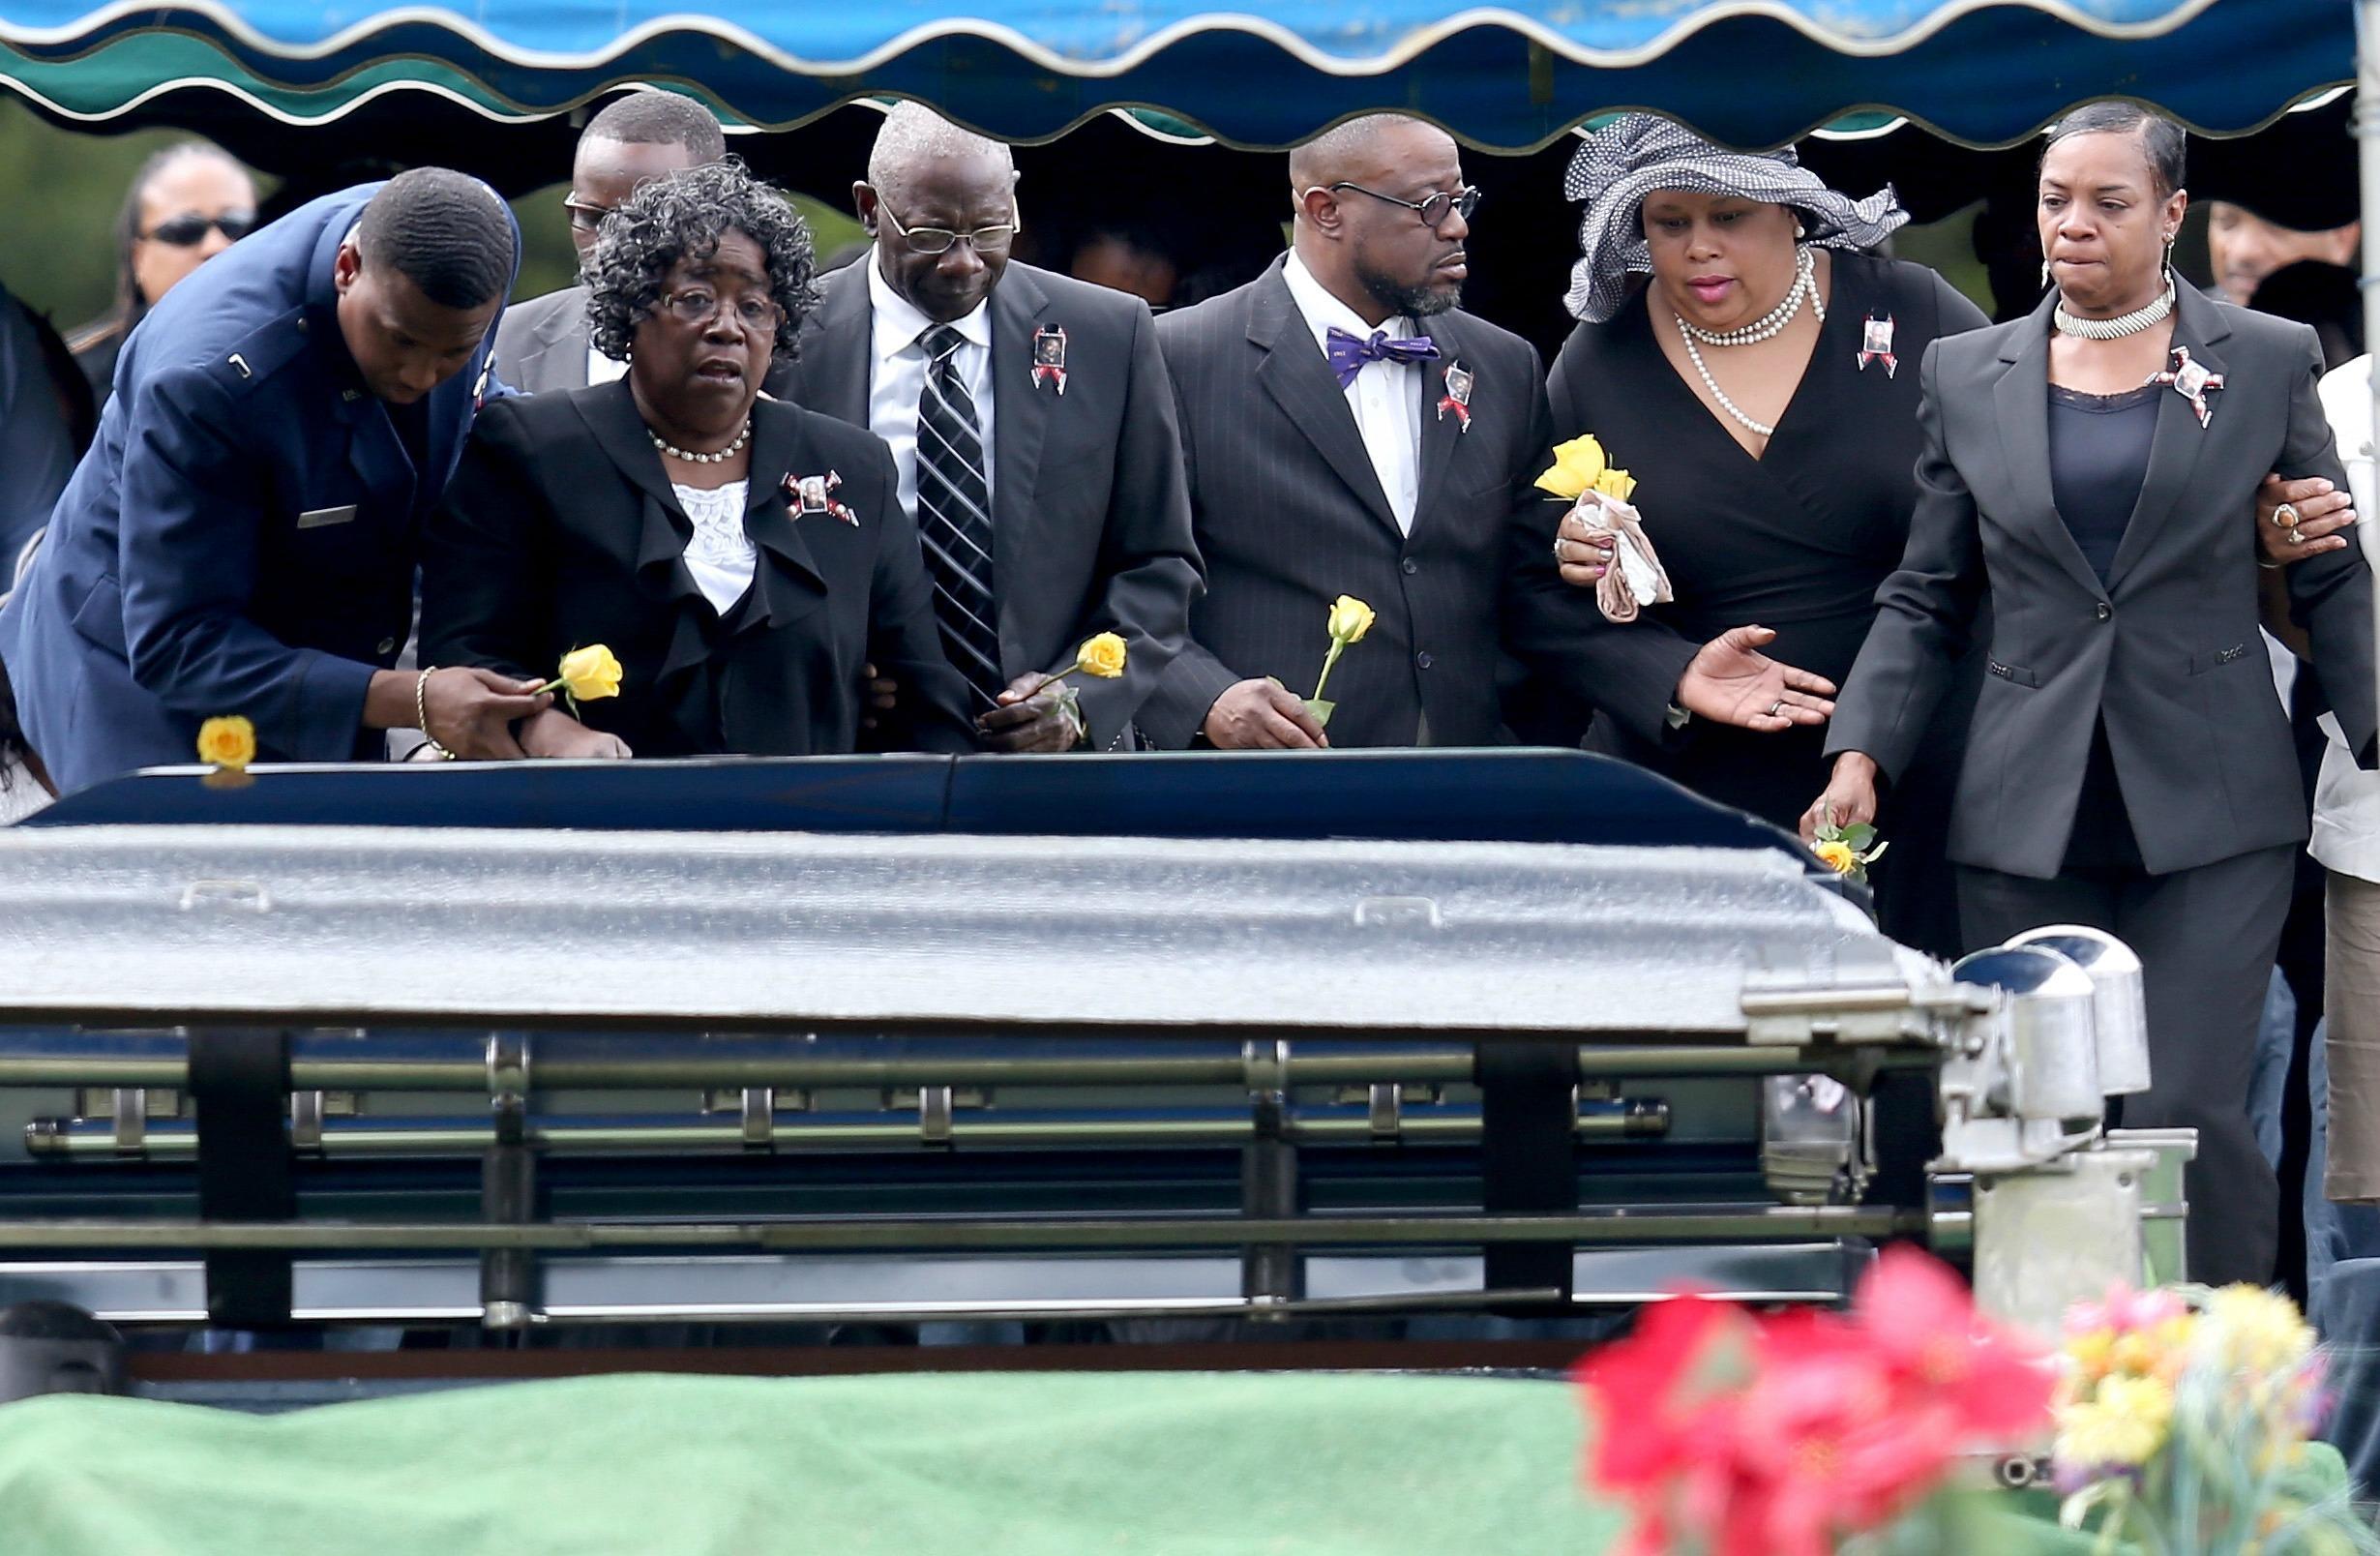 Walter Scott Funeral